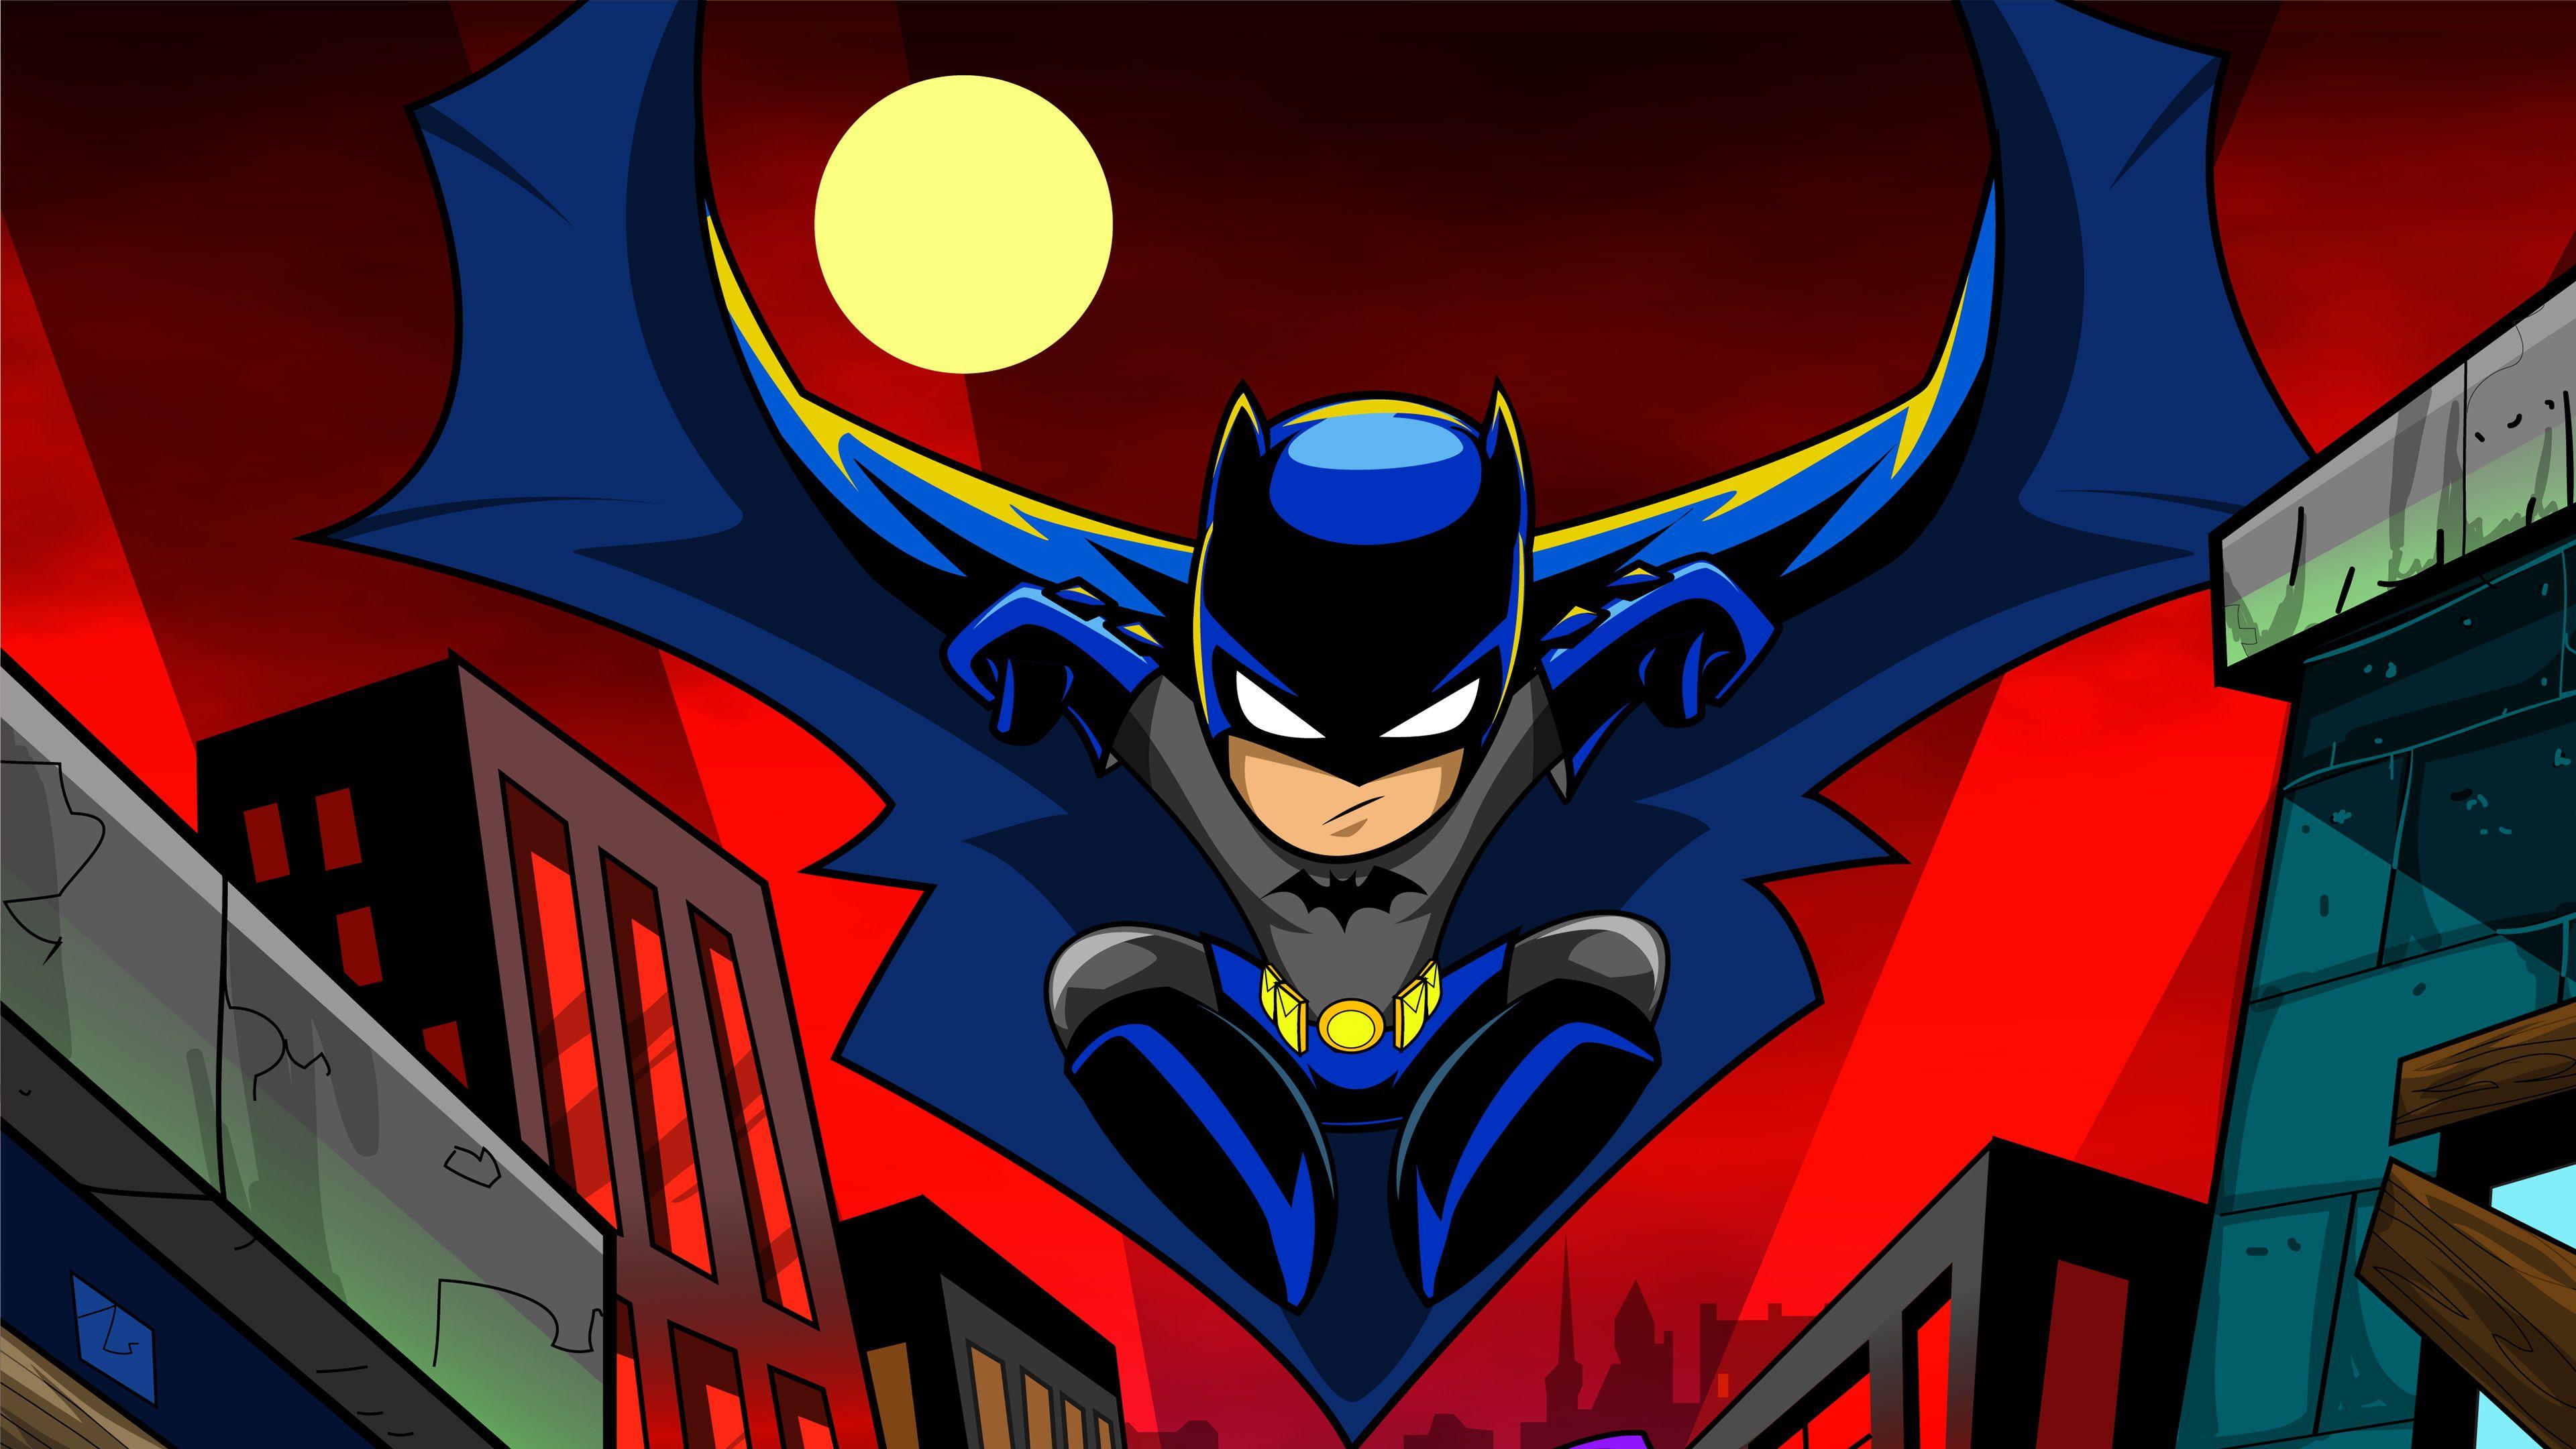 Batman Cartoon Art 4k Superheroes Wallpapers Hd Wallpapers Digital Art Wallpapers Cartoon Wallpapers Batman Wallpaper Cartoon Wallpaper Hd Cartoon Wallpaper